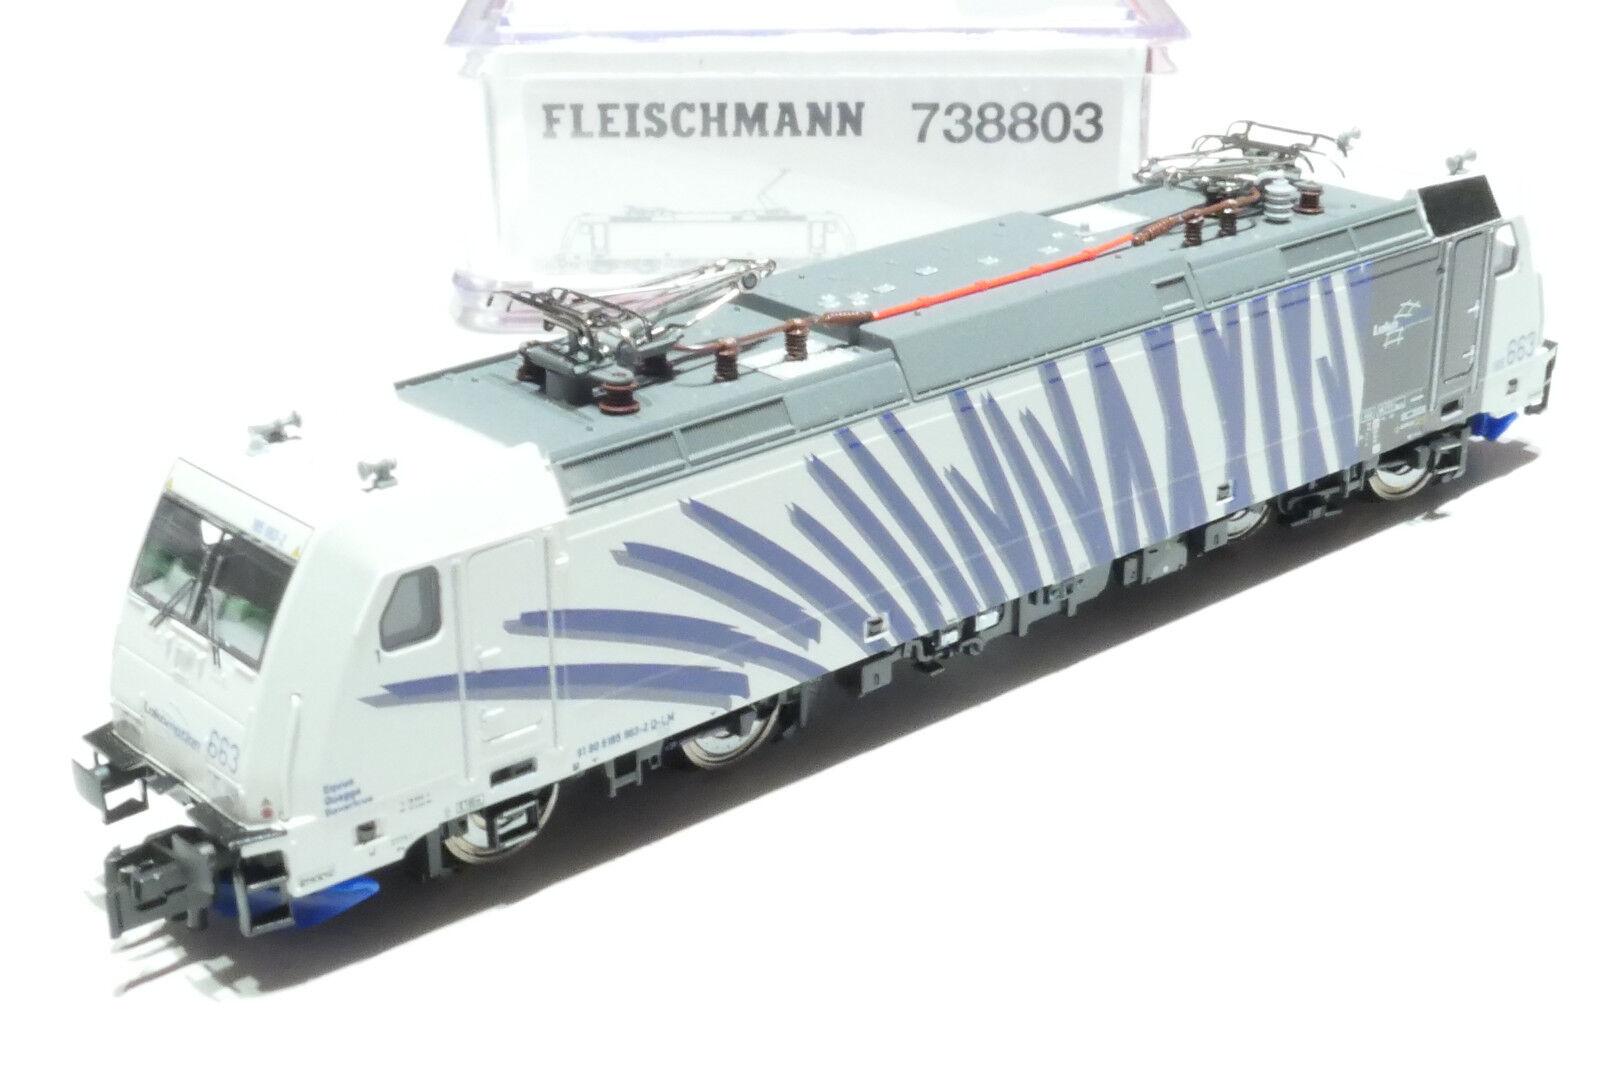 Fleischmann n DB AG Lokomotion 185.663 blancoo azul 738803 nuevo embalaje original